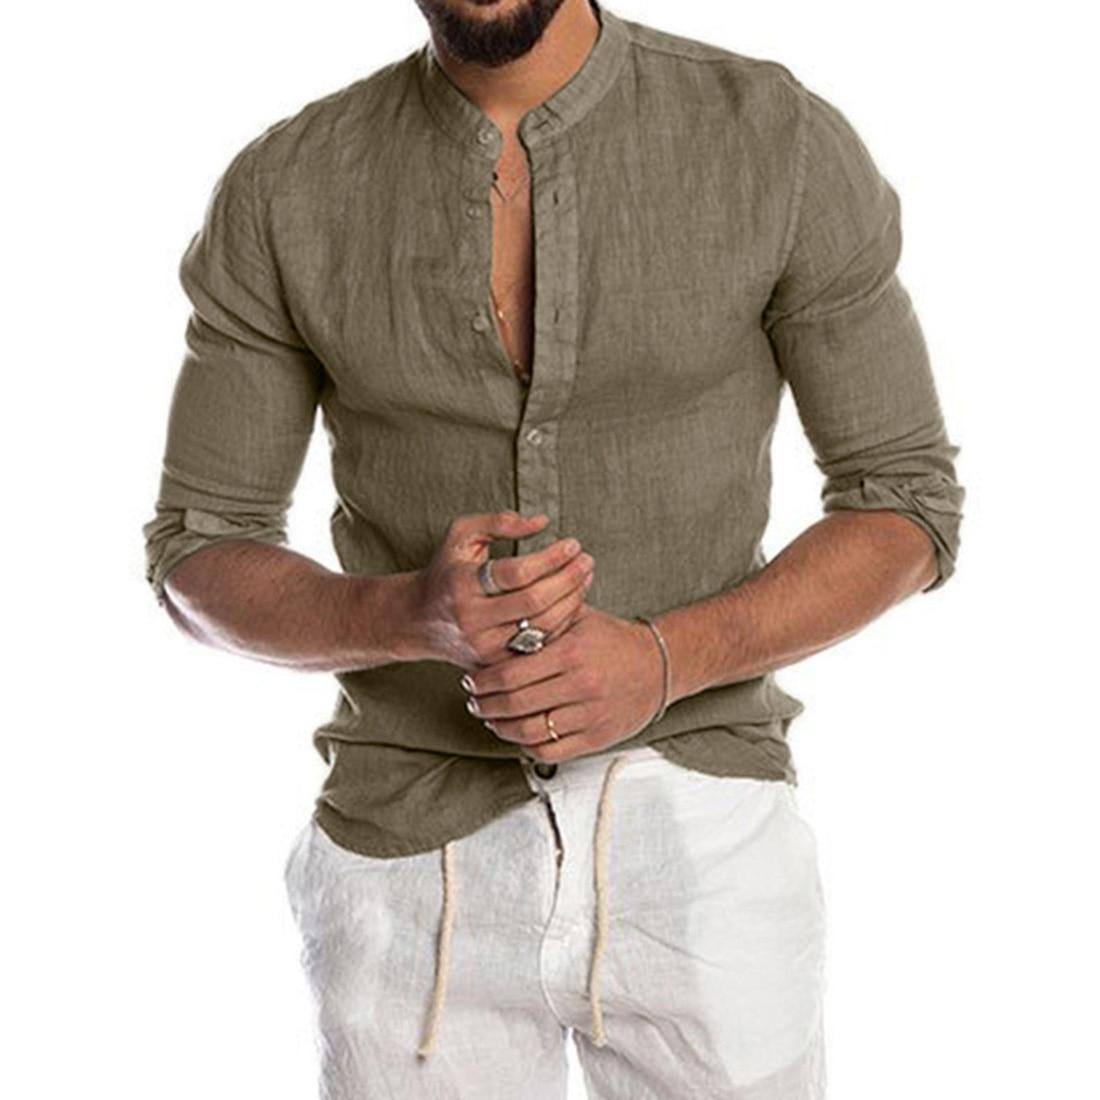 Laamei 2020 New Men's Casual Blouse Cotton Linen Shirt Loose Tops Shirt Spring Autumn Casual Handsome Men Long Sleeve Shirt